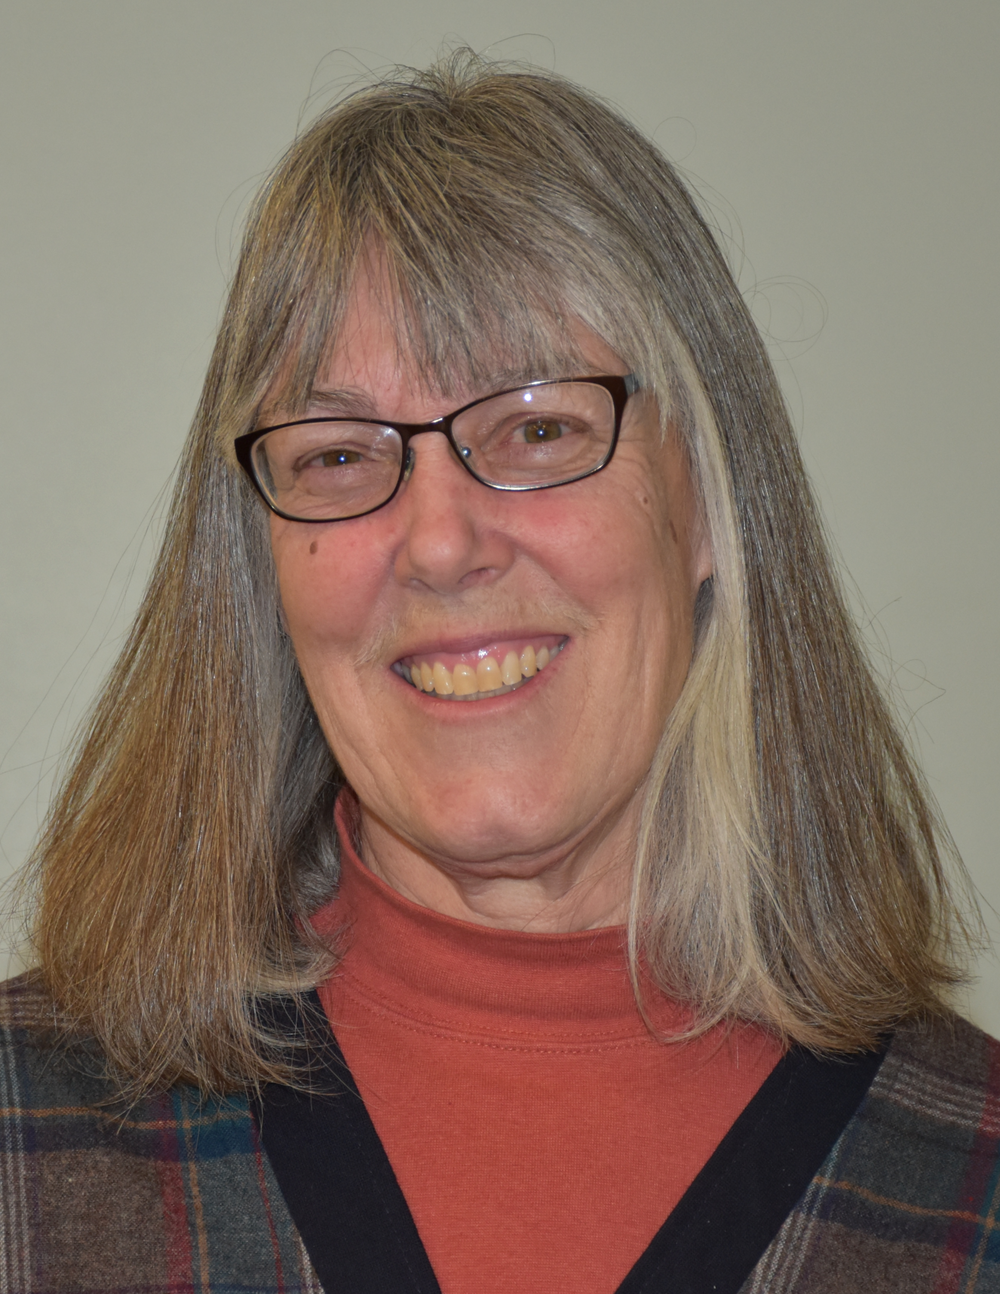 Mitzi Rosillon, Secretary